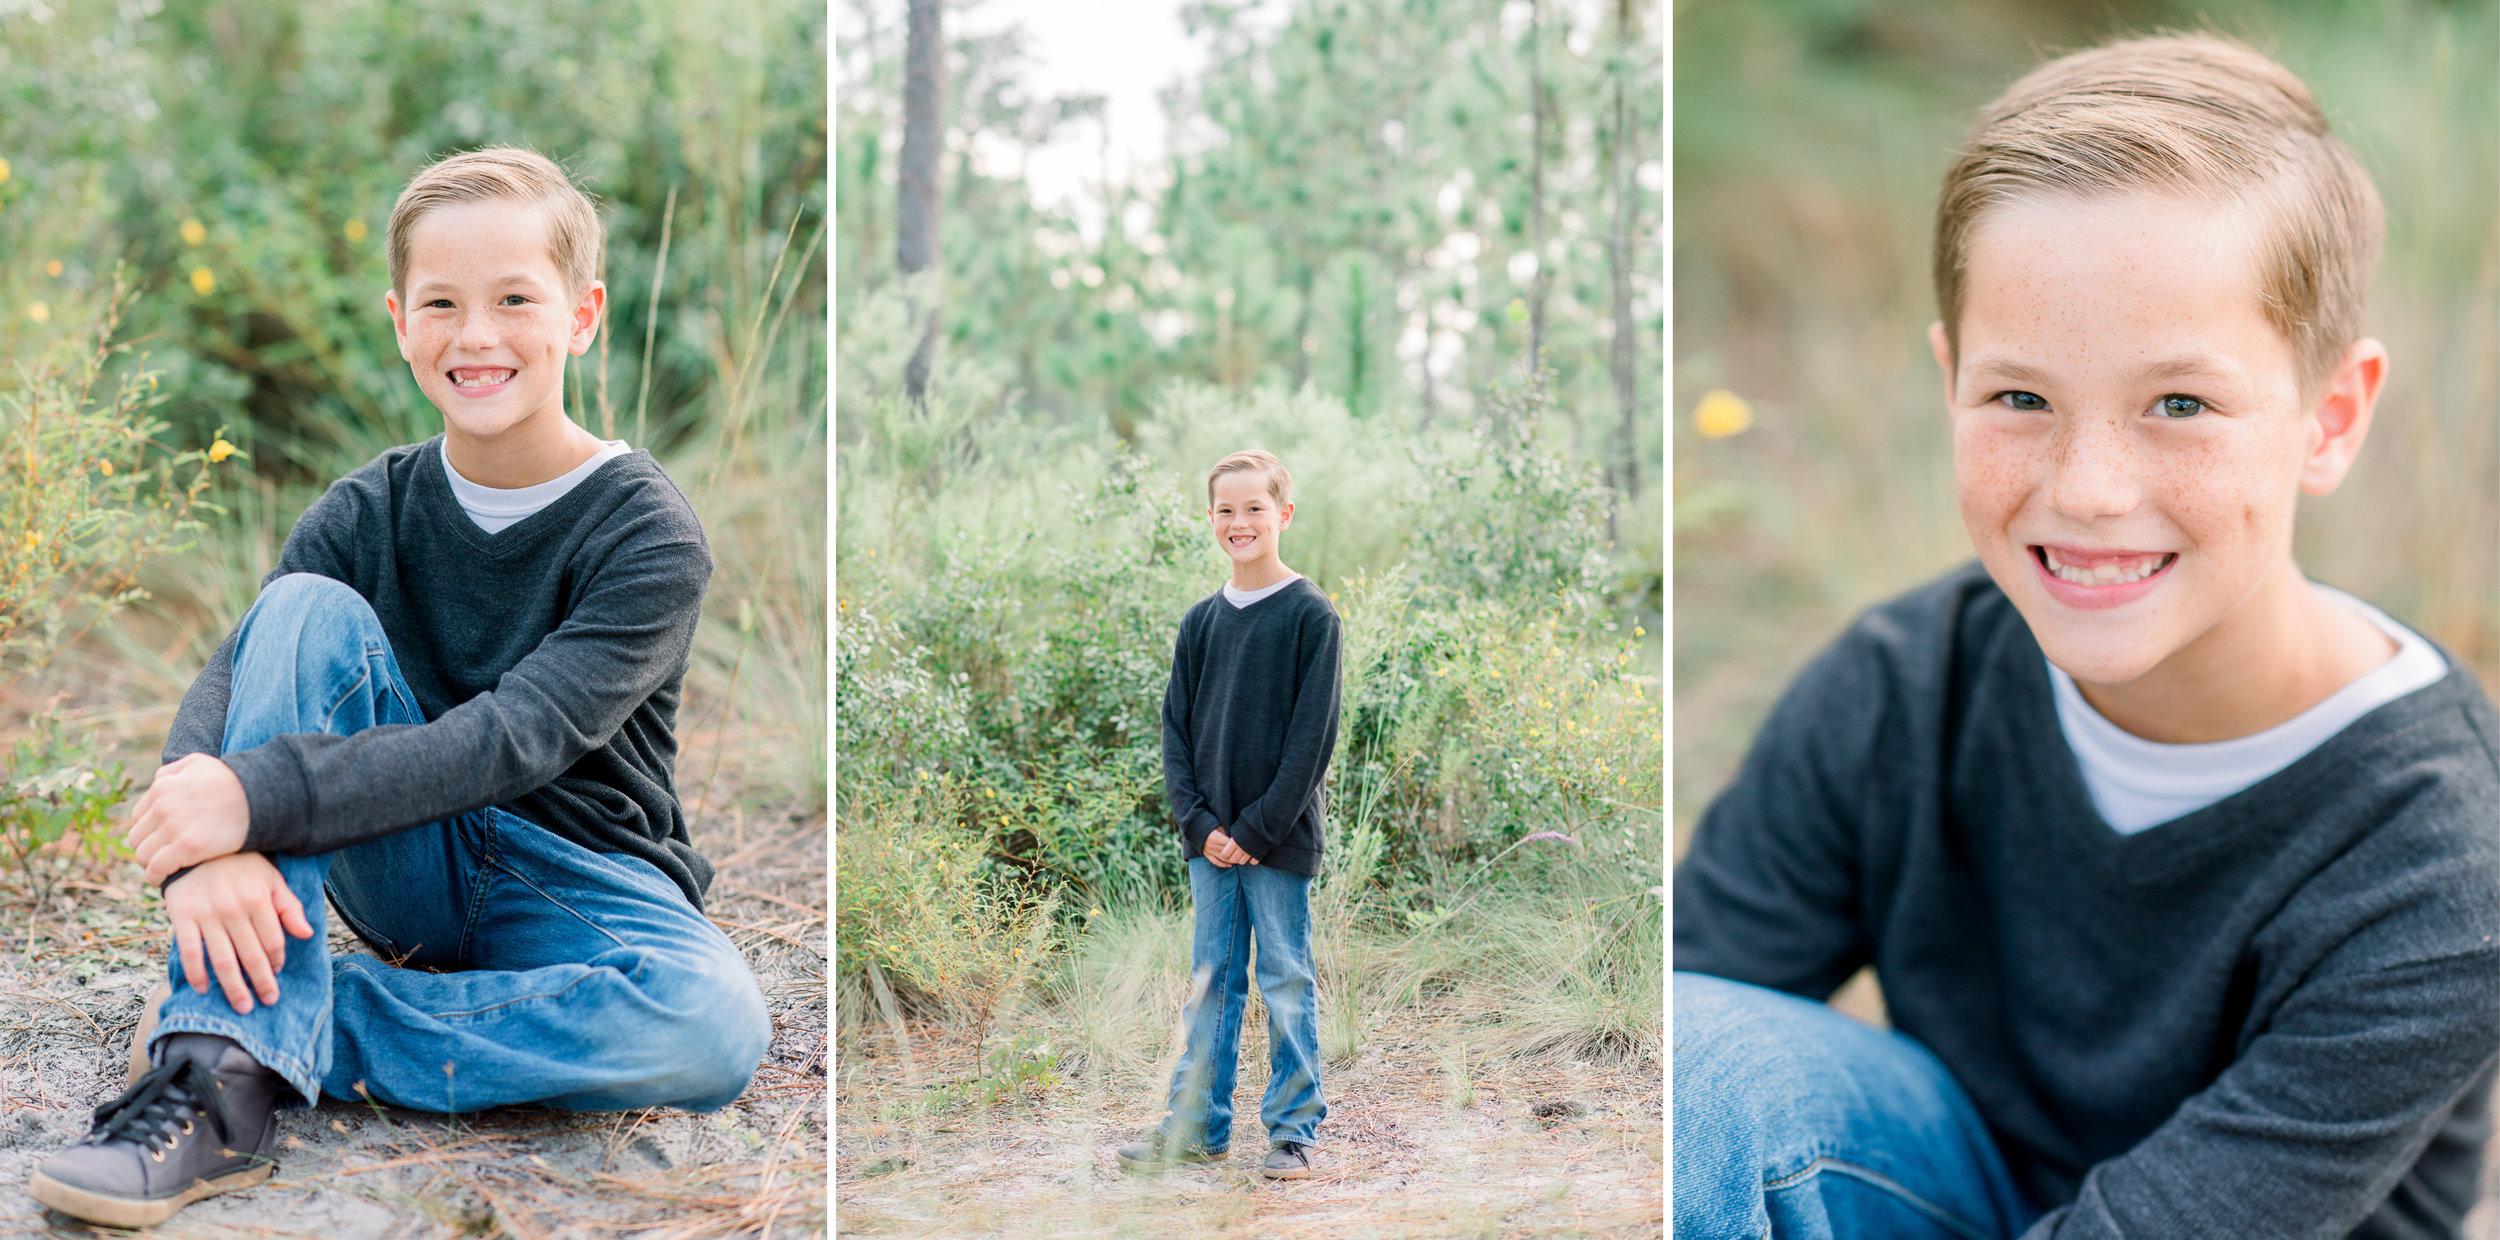 KateTaramykinStudios-Wekiva-Springs-Family-Photographer-Donald-14.jpg